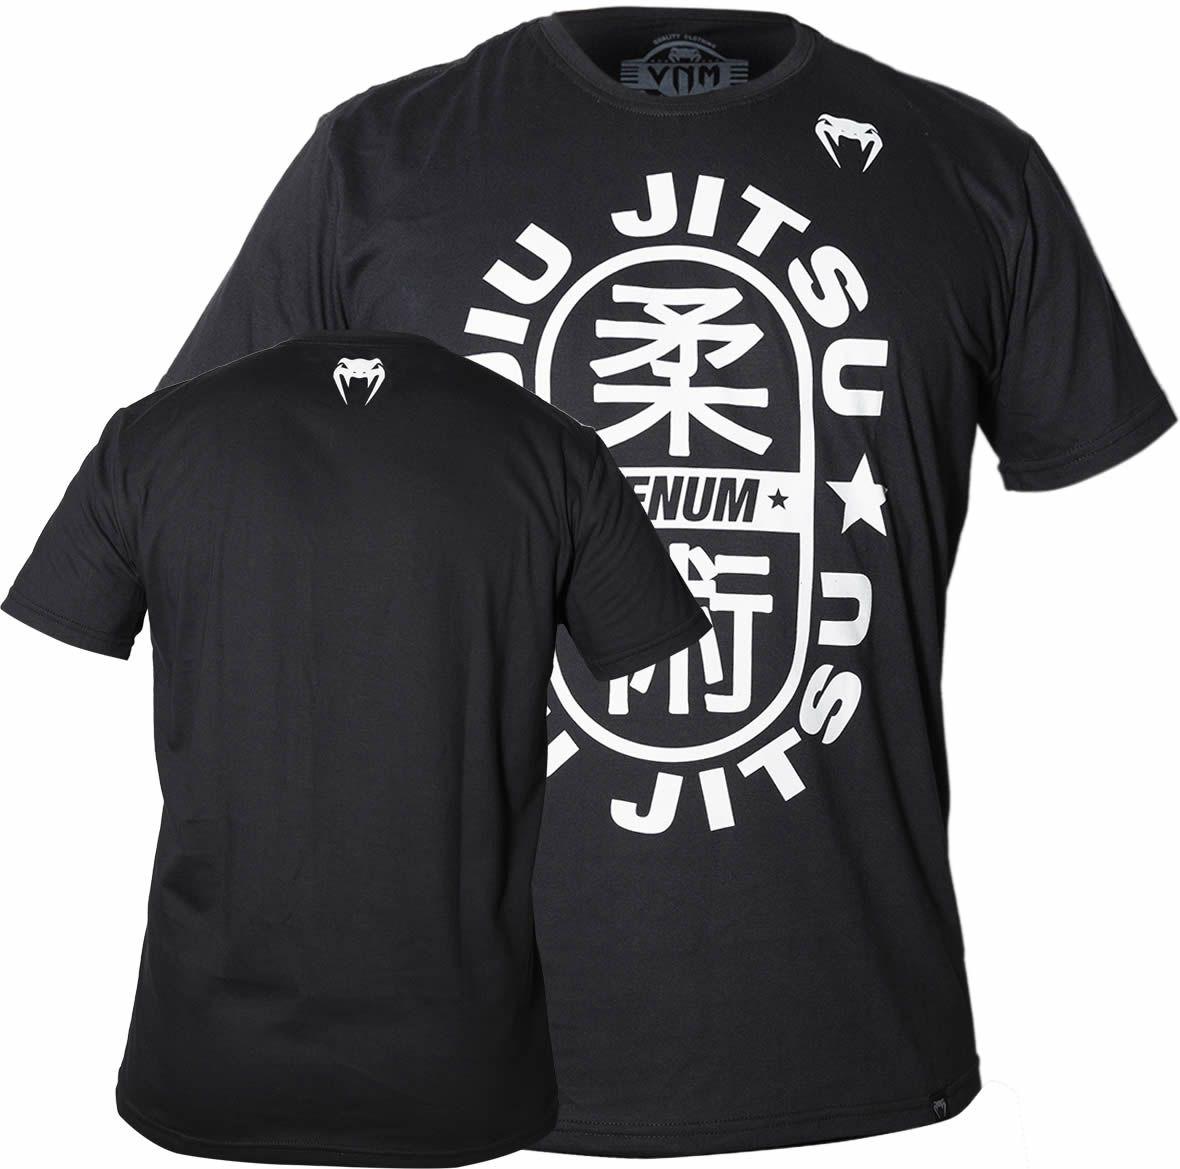 Camisa Camiseta Jiu Jitsu Star - Preta - Venum